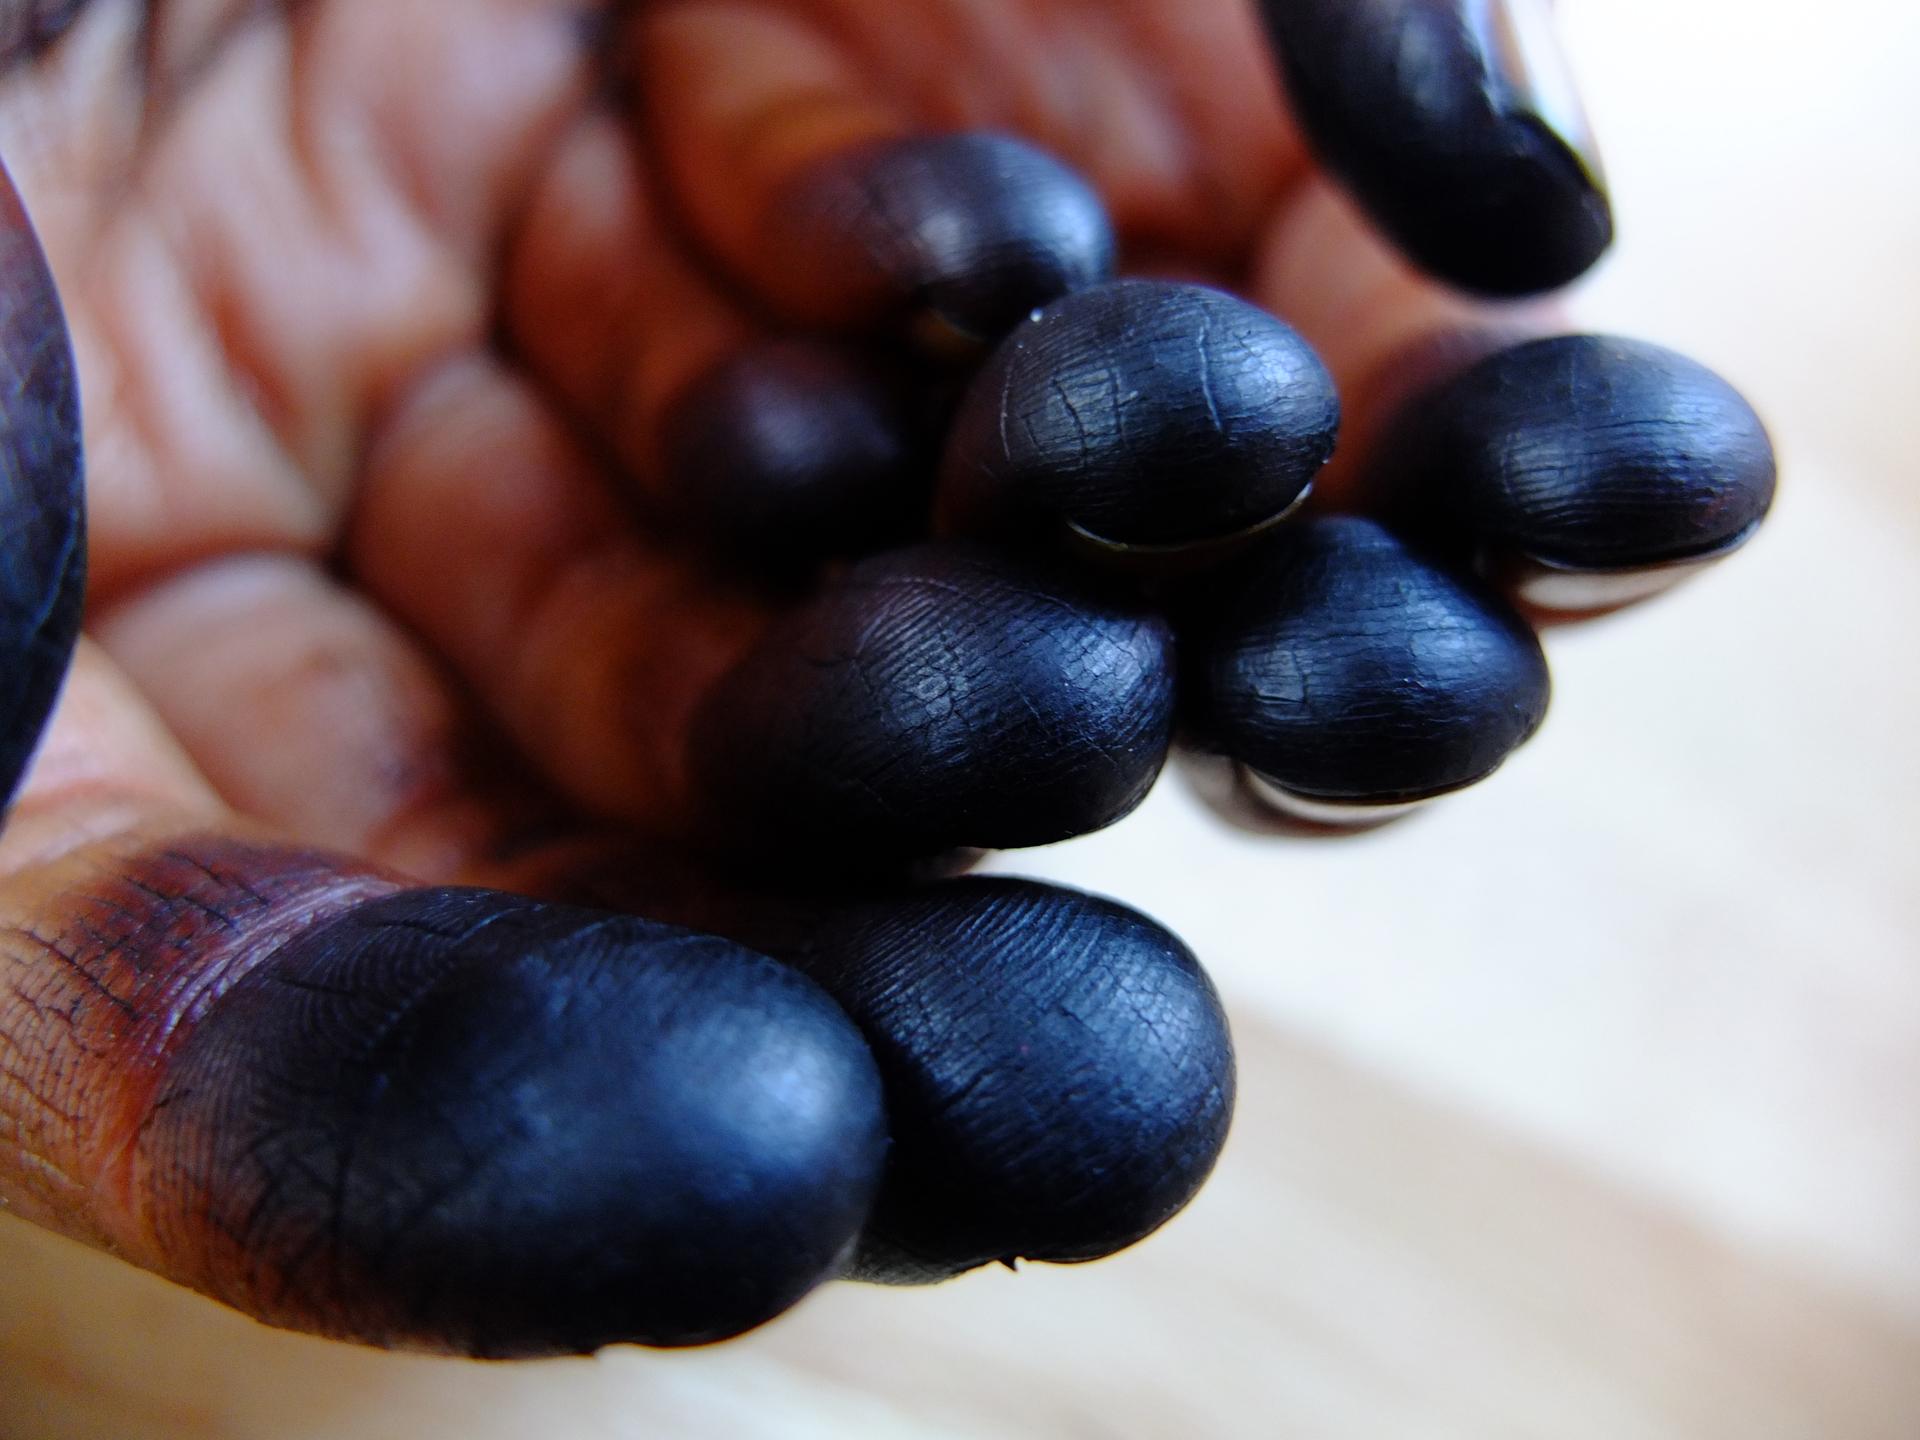 Juglans manos